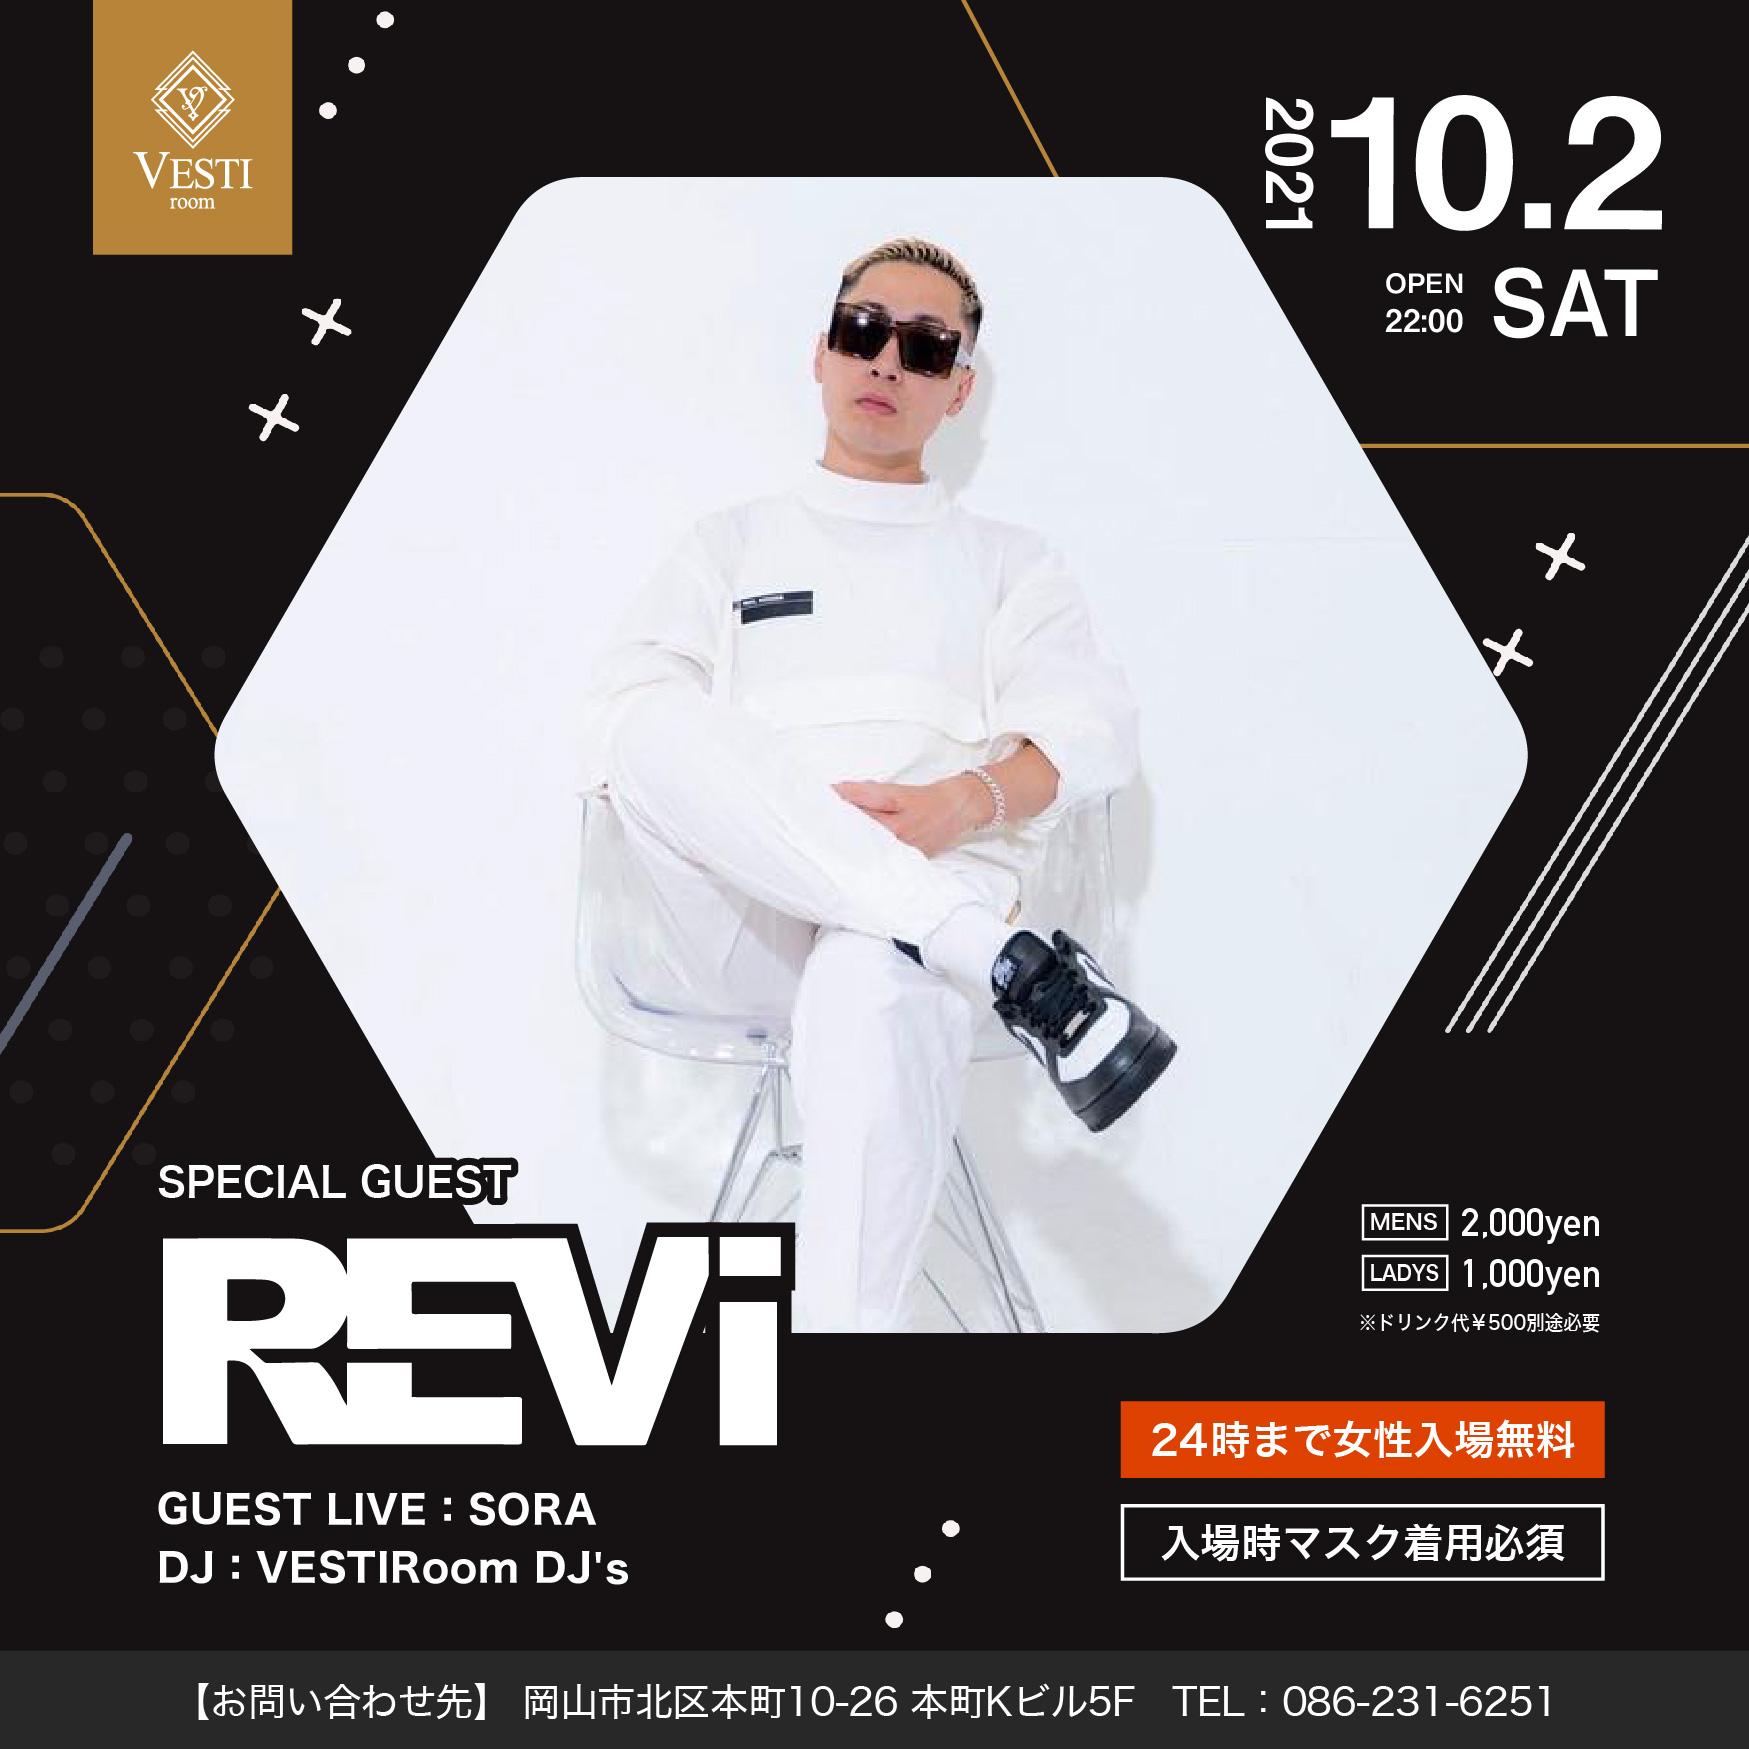 Special Guest : REVI ~24時まで女性入場無料~